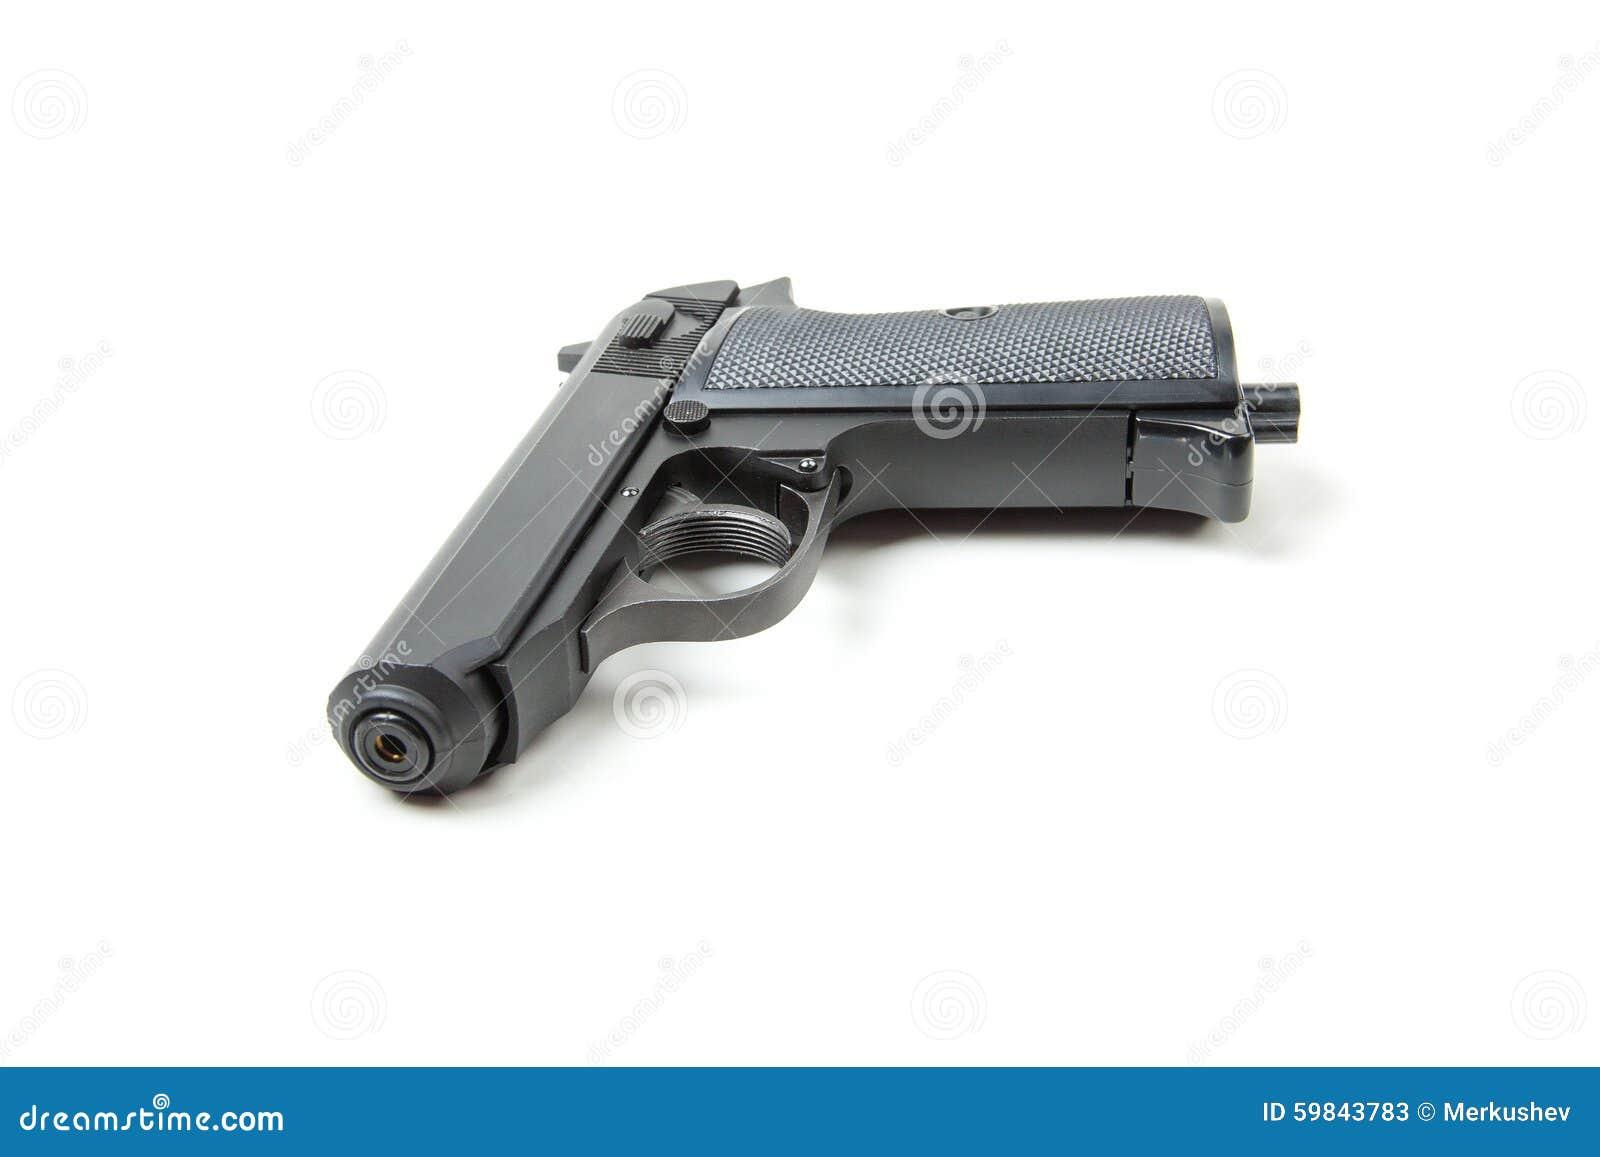 gun white background - photo #39